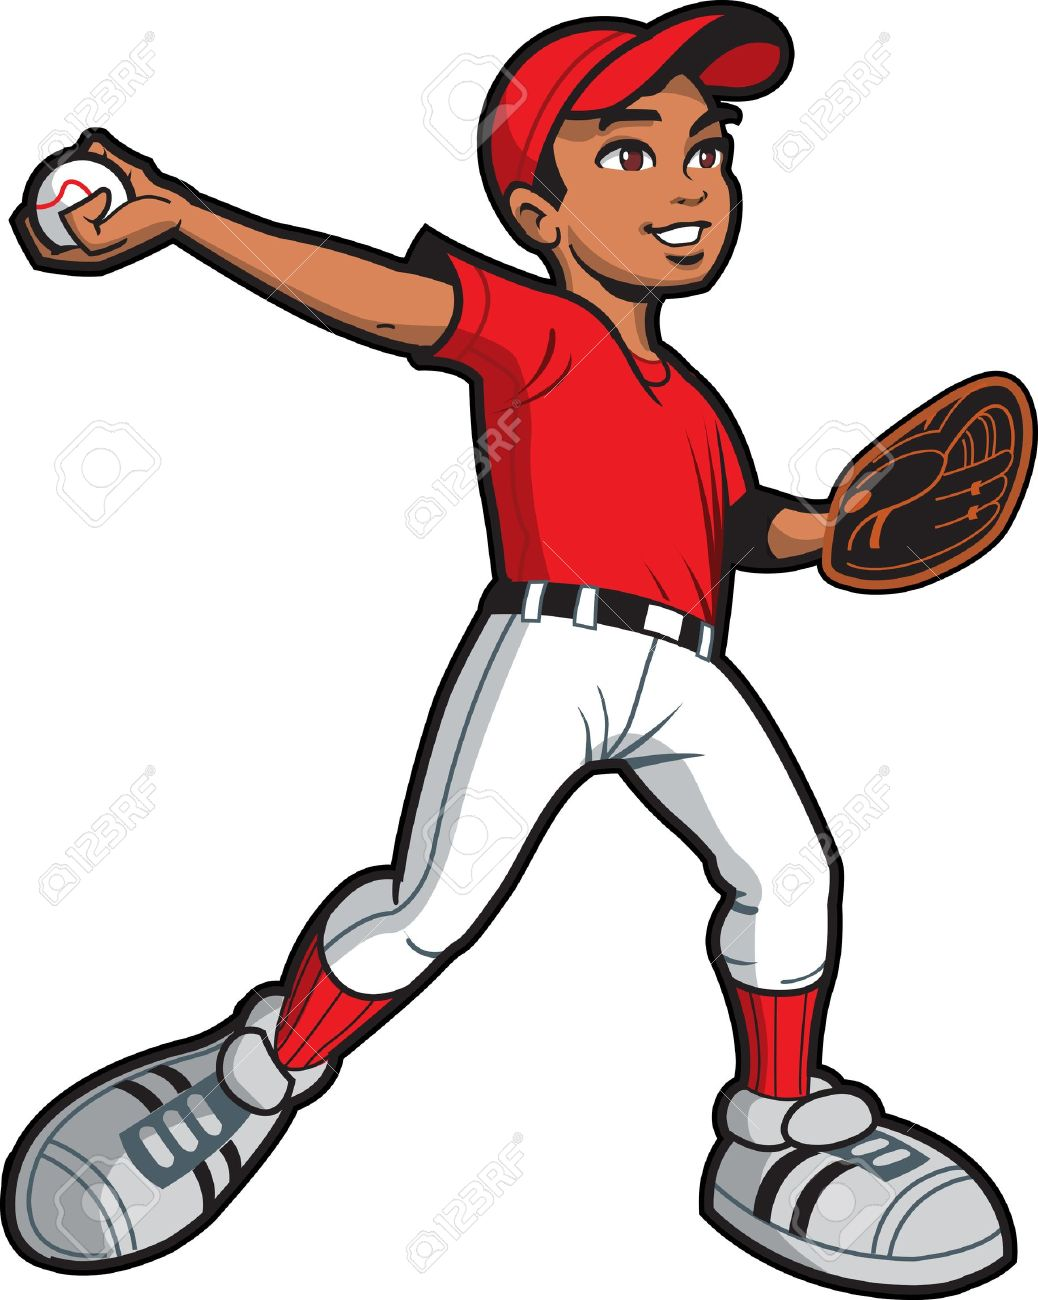 ethnic young man baseball softball pitcher throwing a pitch royalty rh 123rf com Tennis Silhouette Clip Art Court Tennis Racket Clip Art